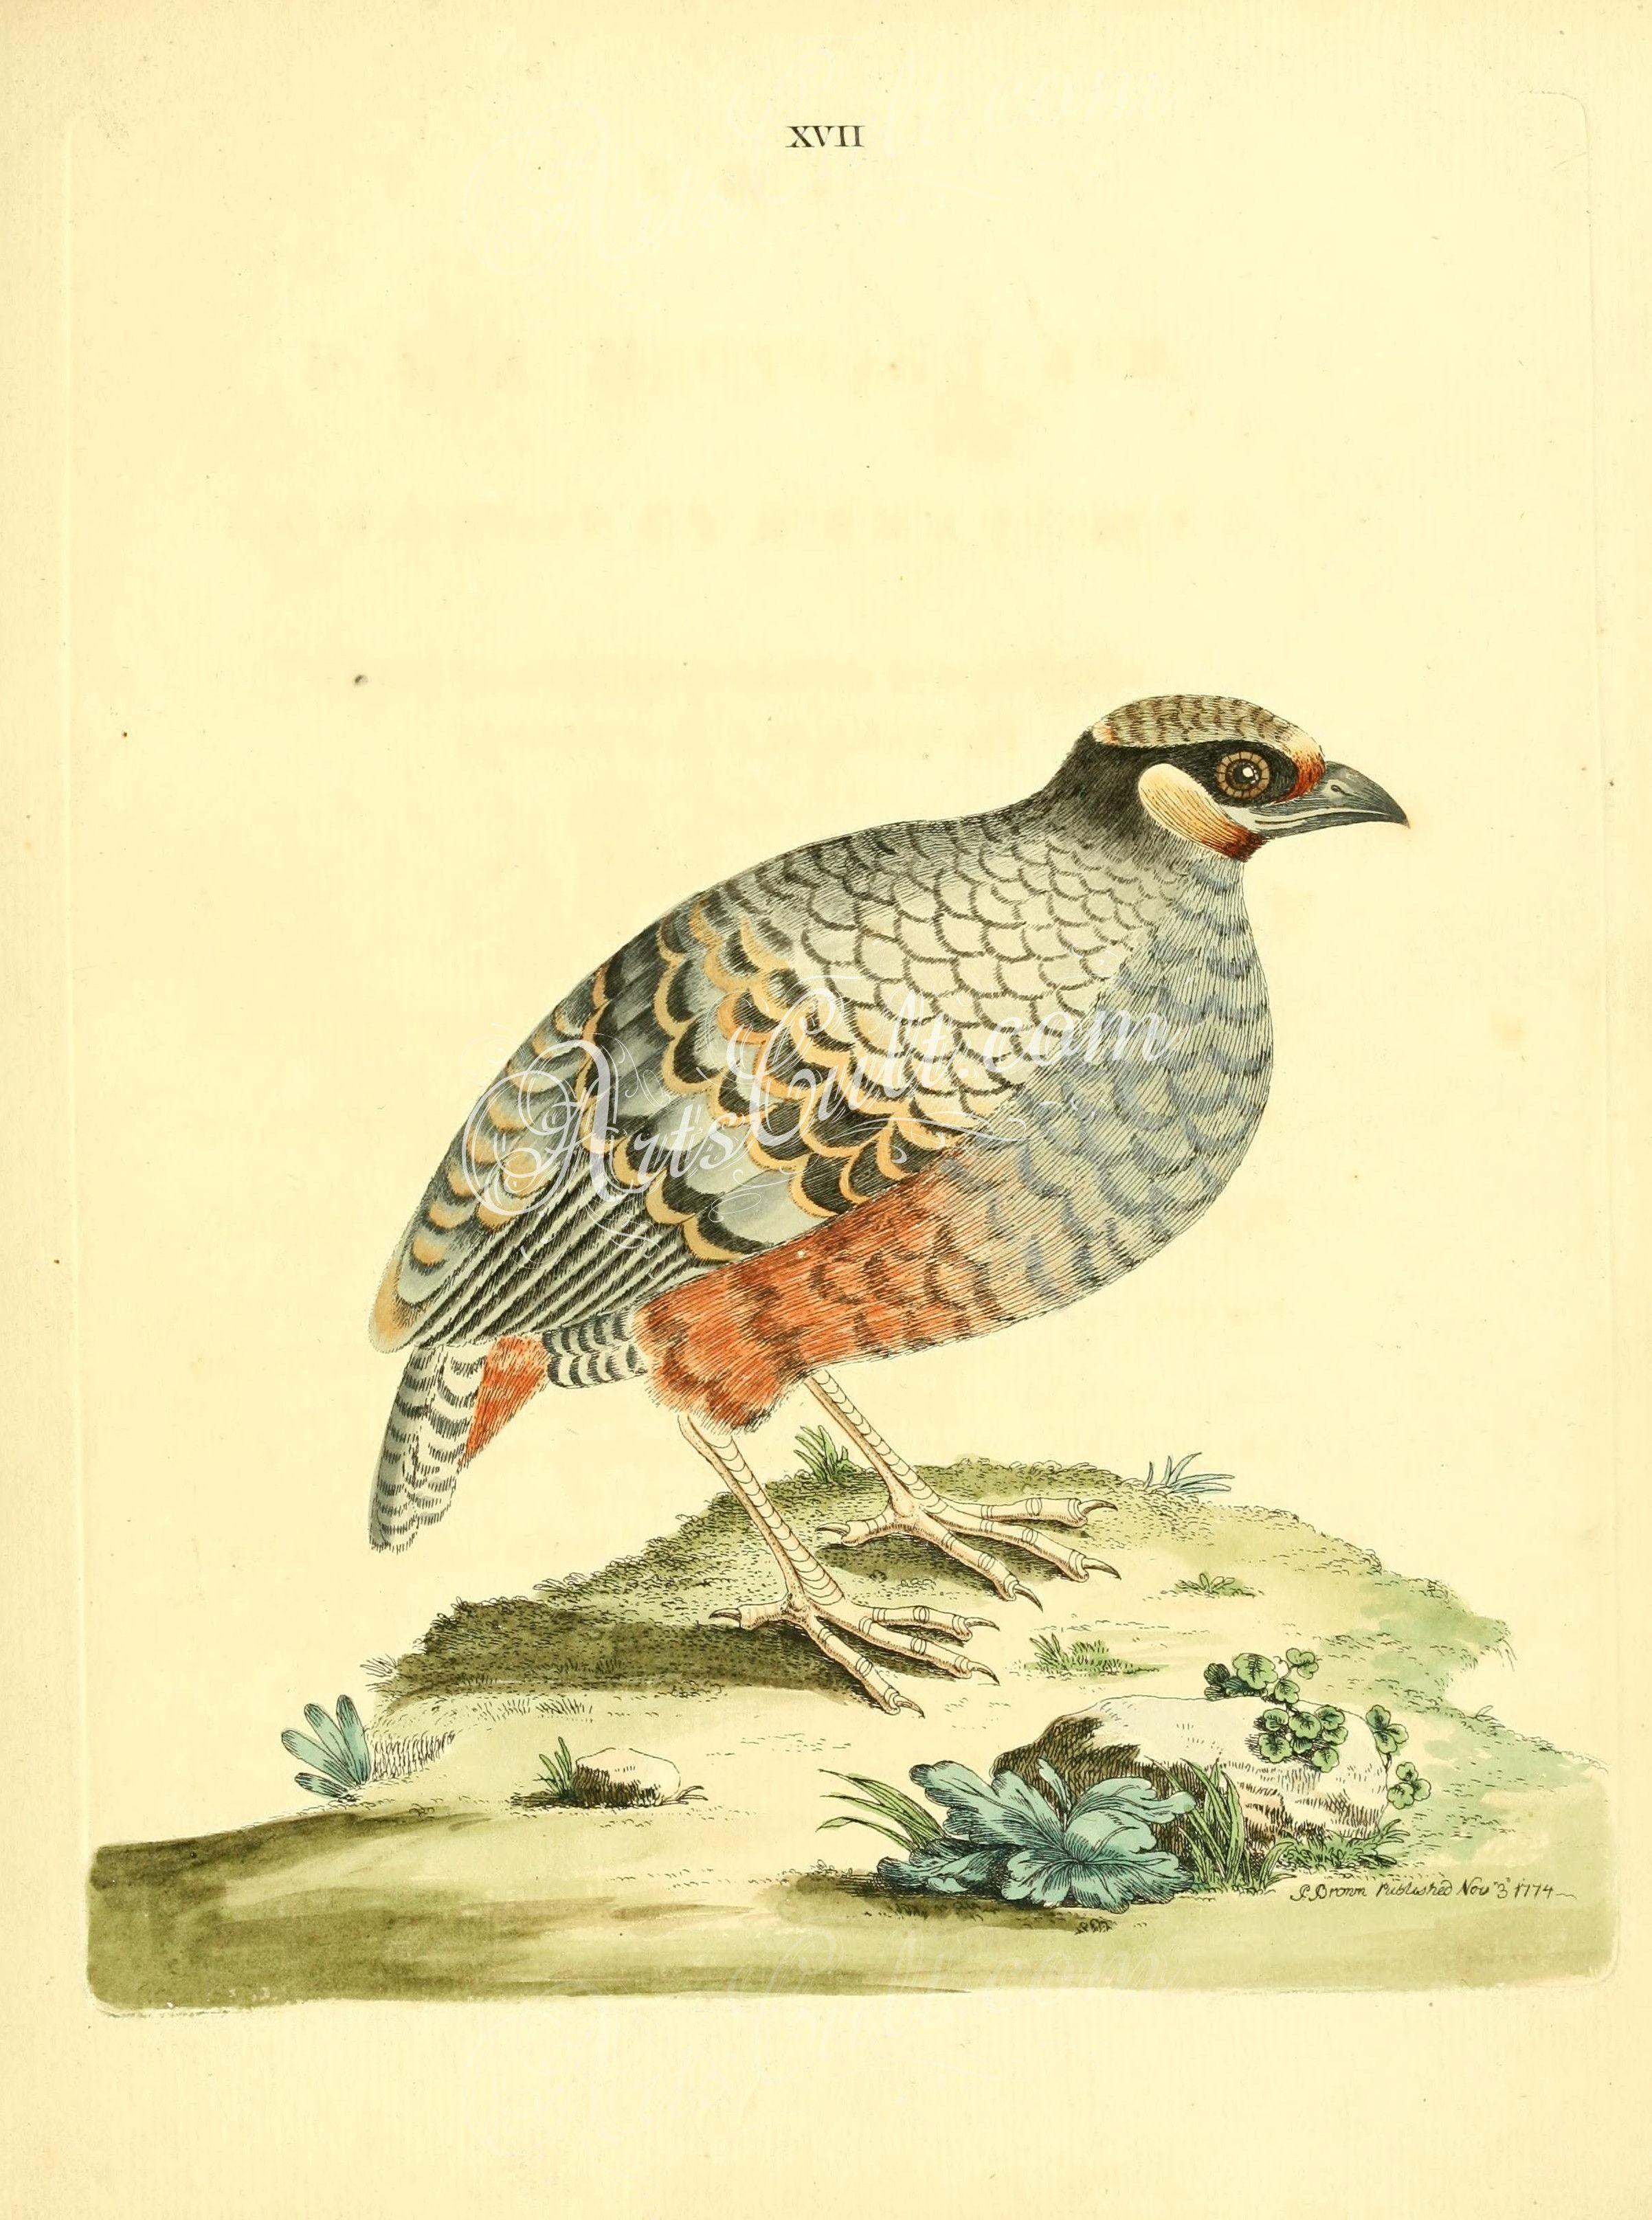 Birds javan partridge botanical floral botany natural